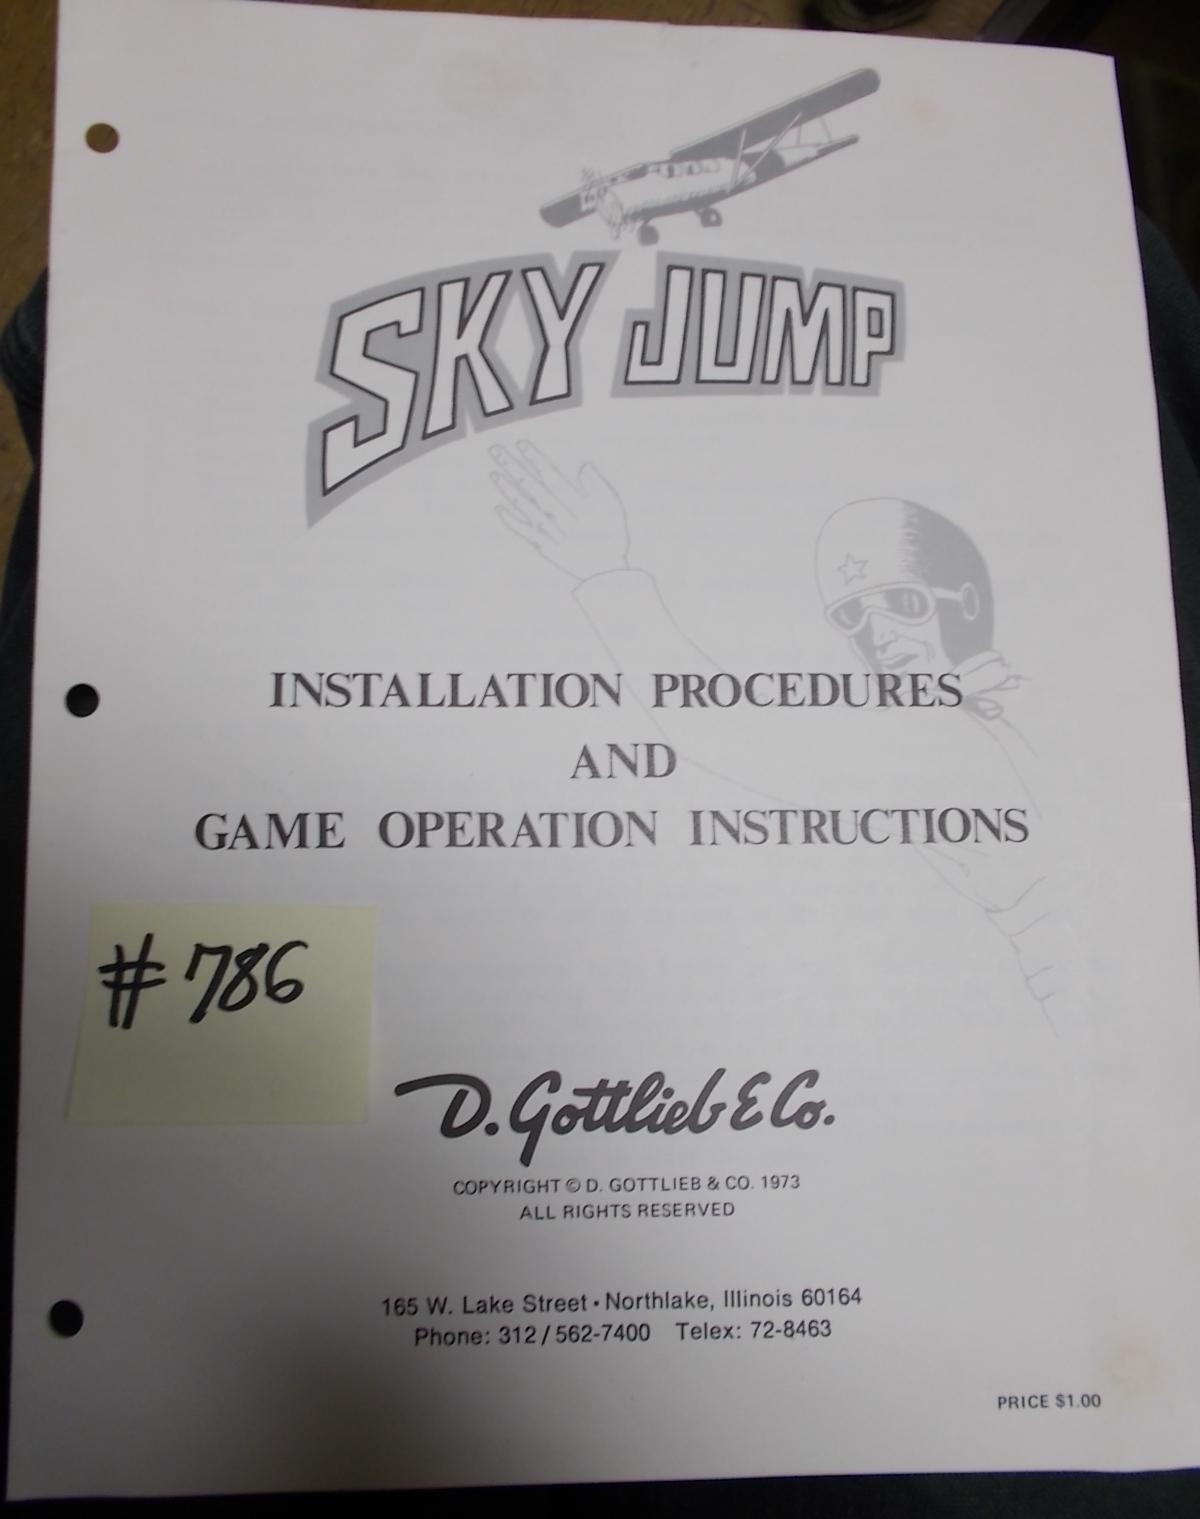 Sky Jump Pinball Machine Game Installation Procedures Game